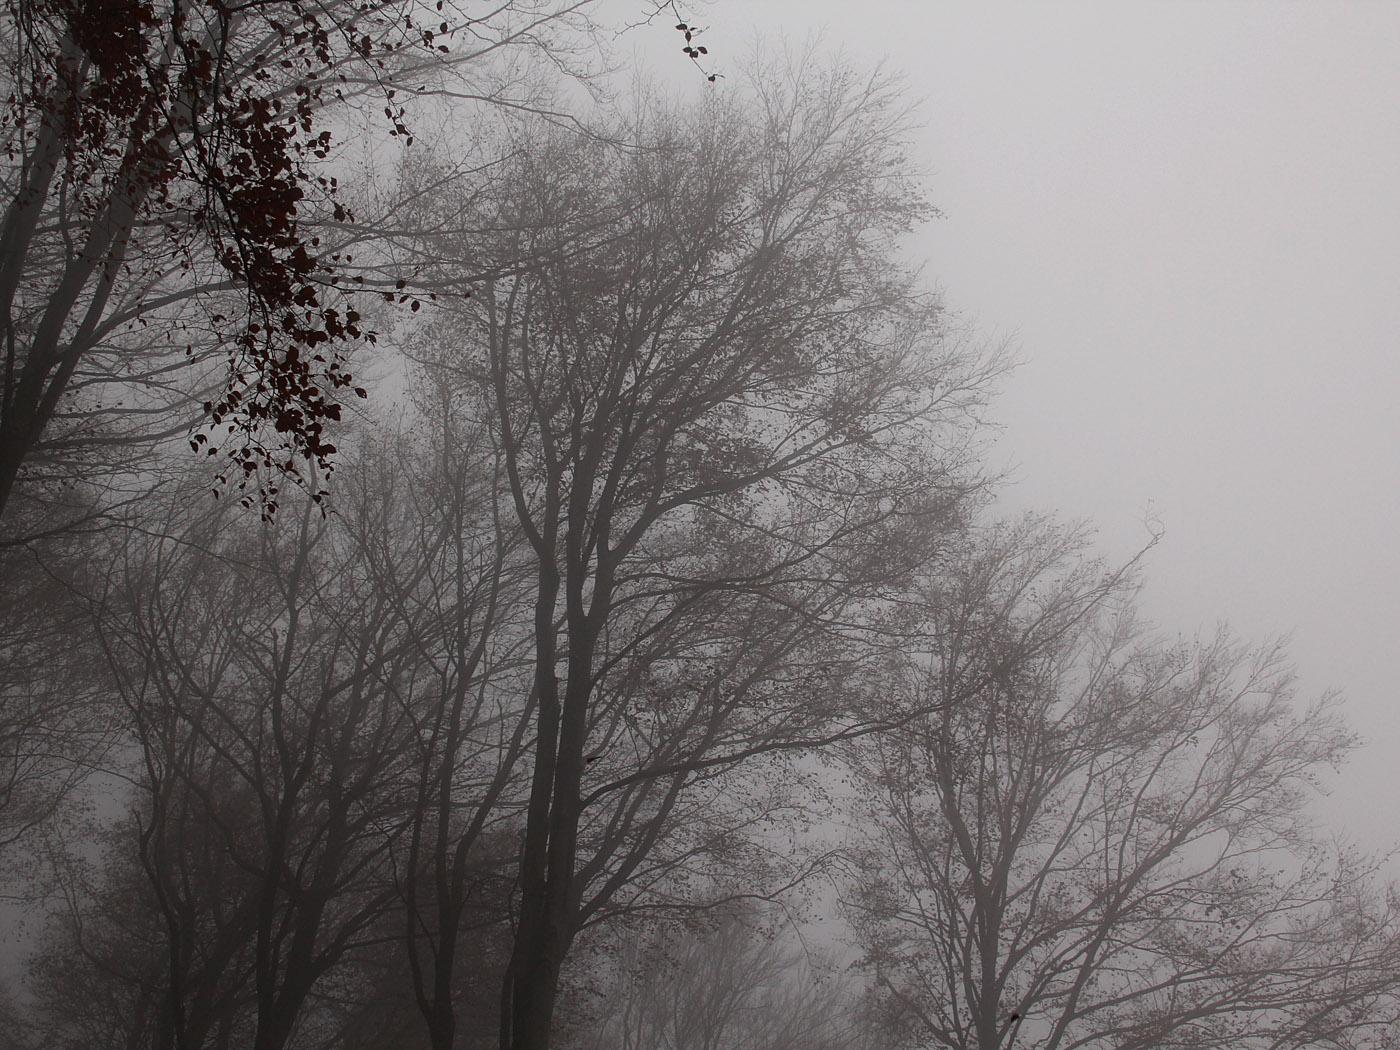 Nebel-Matchmacherei